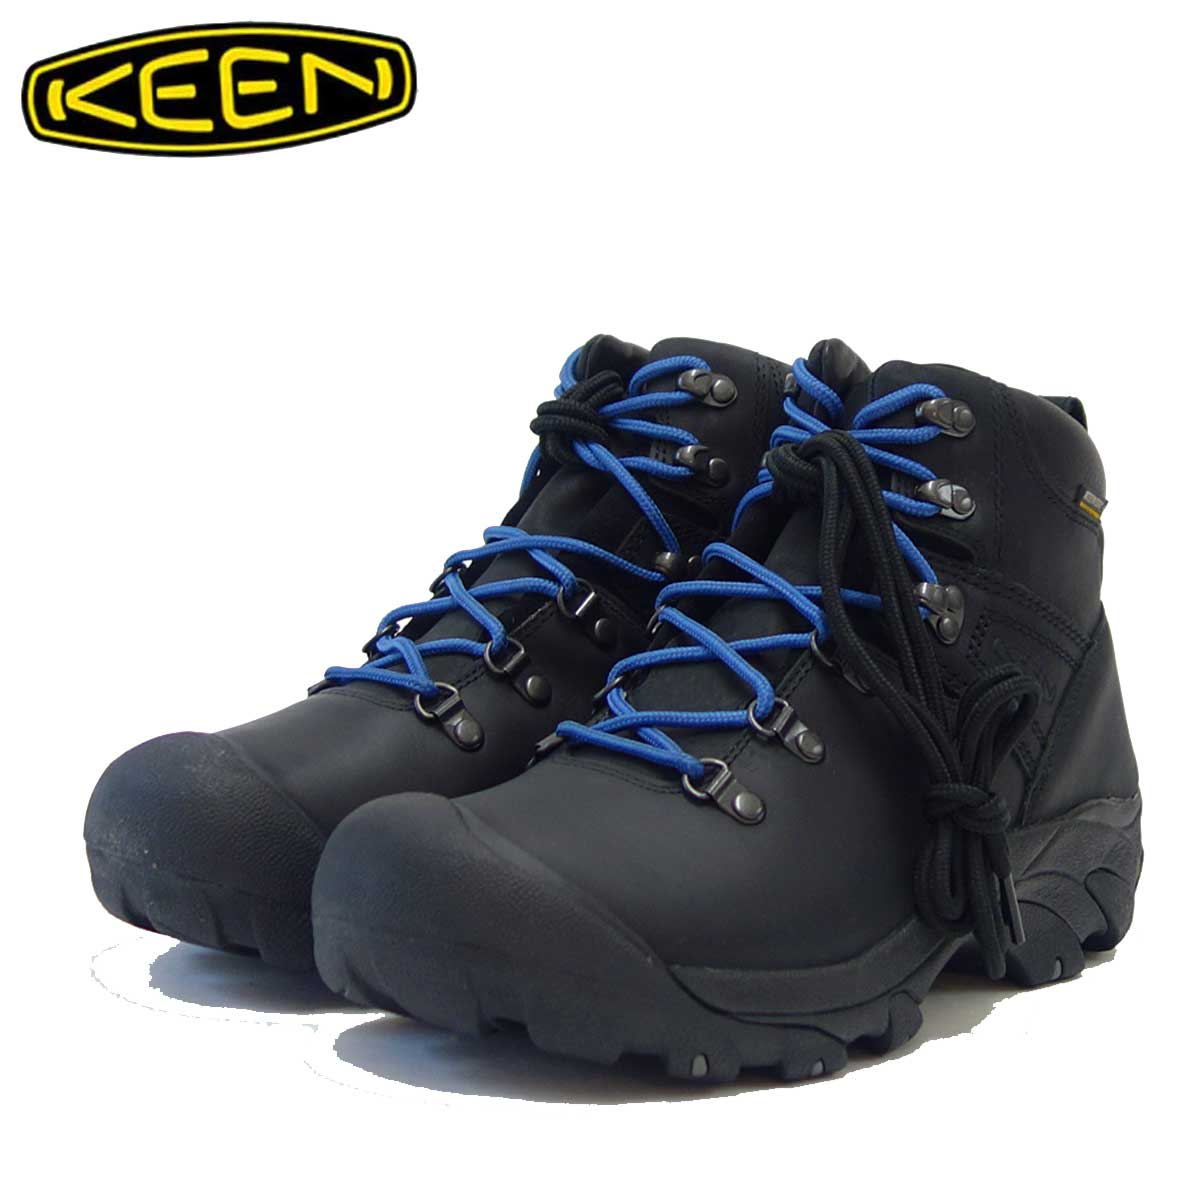 KEEN キーン Pyenees 1021609 ピレニーズ カラー:Black / Galaxy Blue(メンズ)「靴」